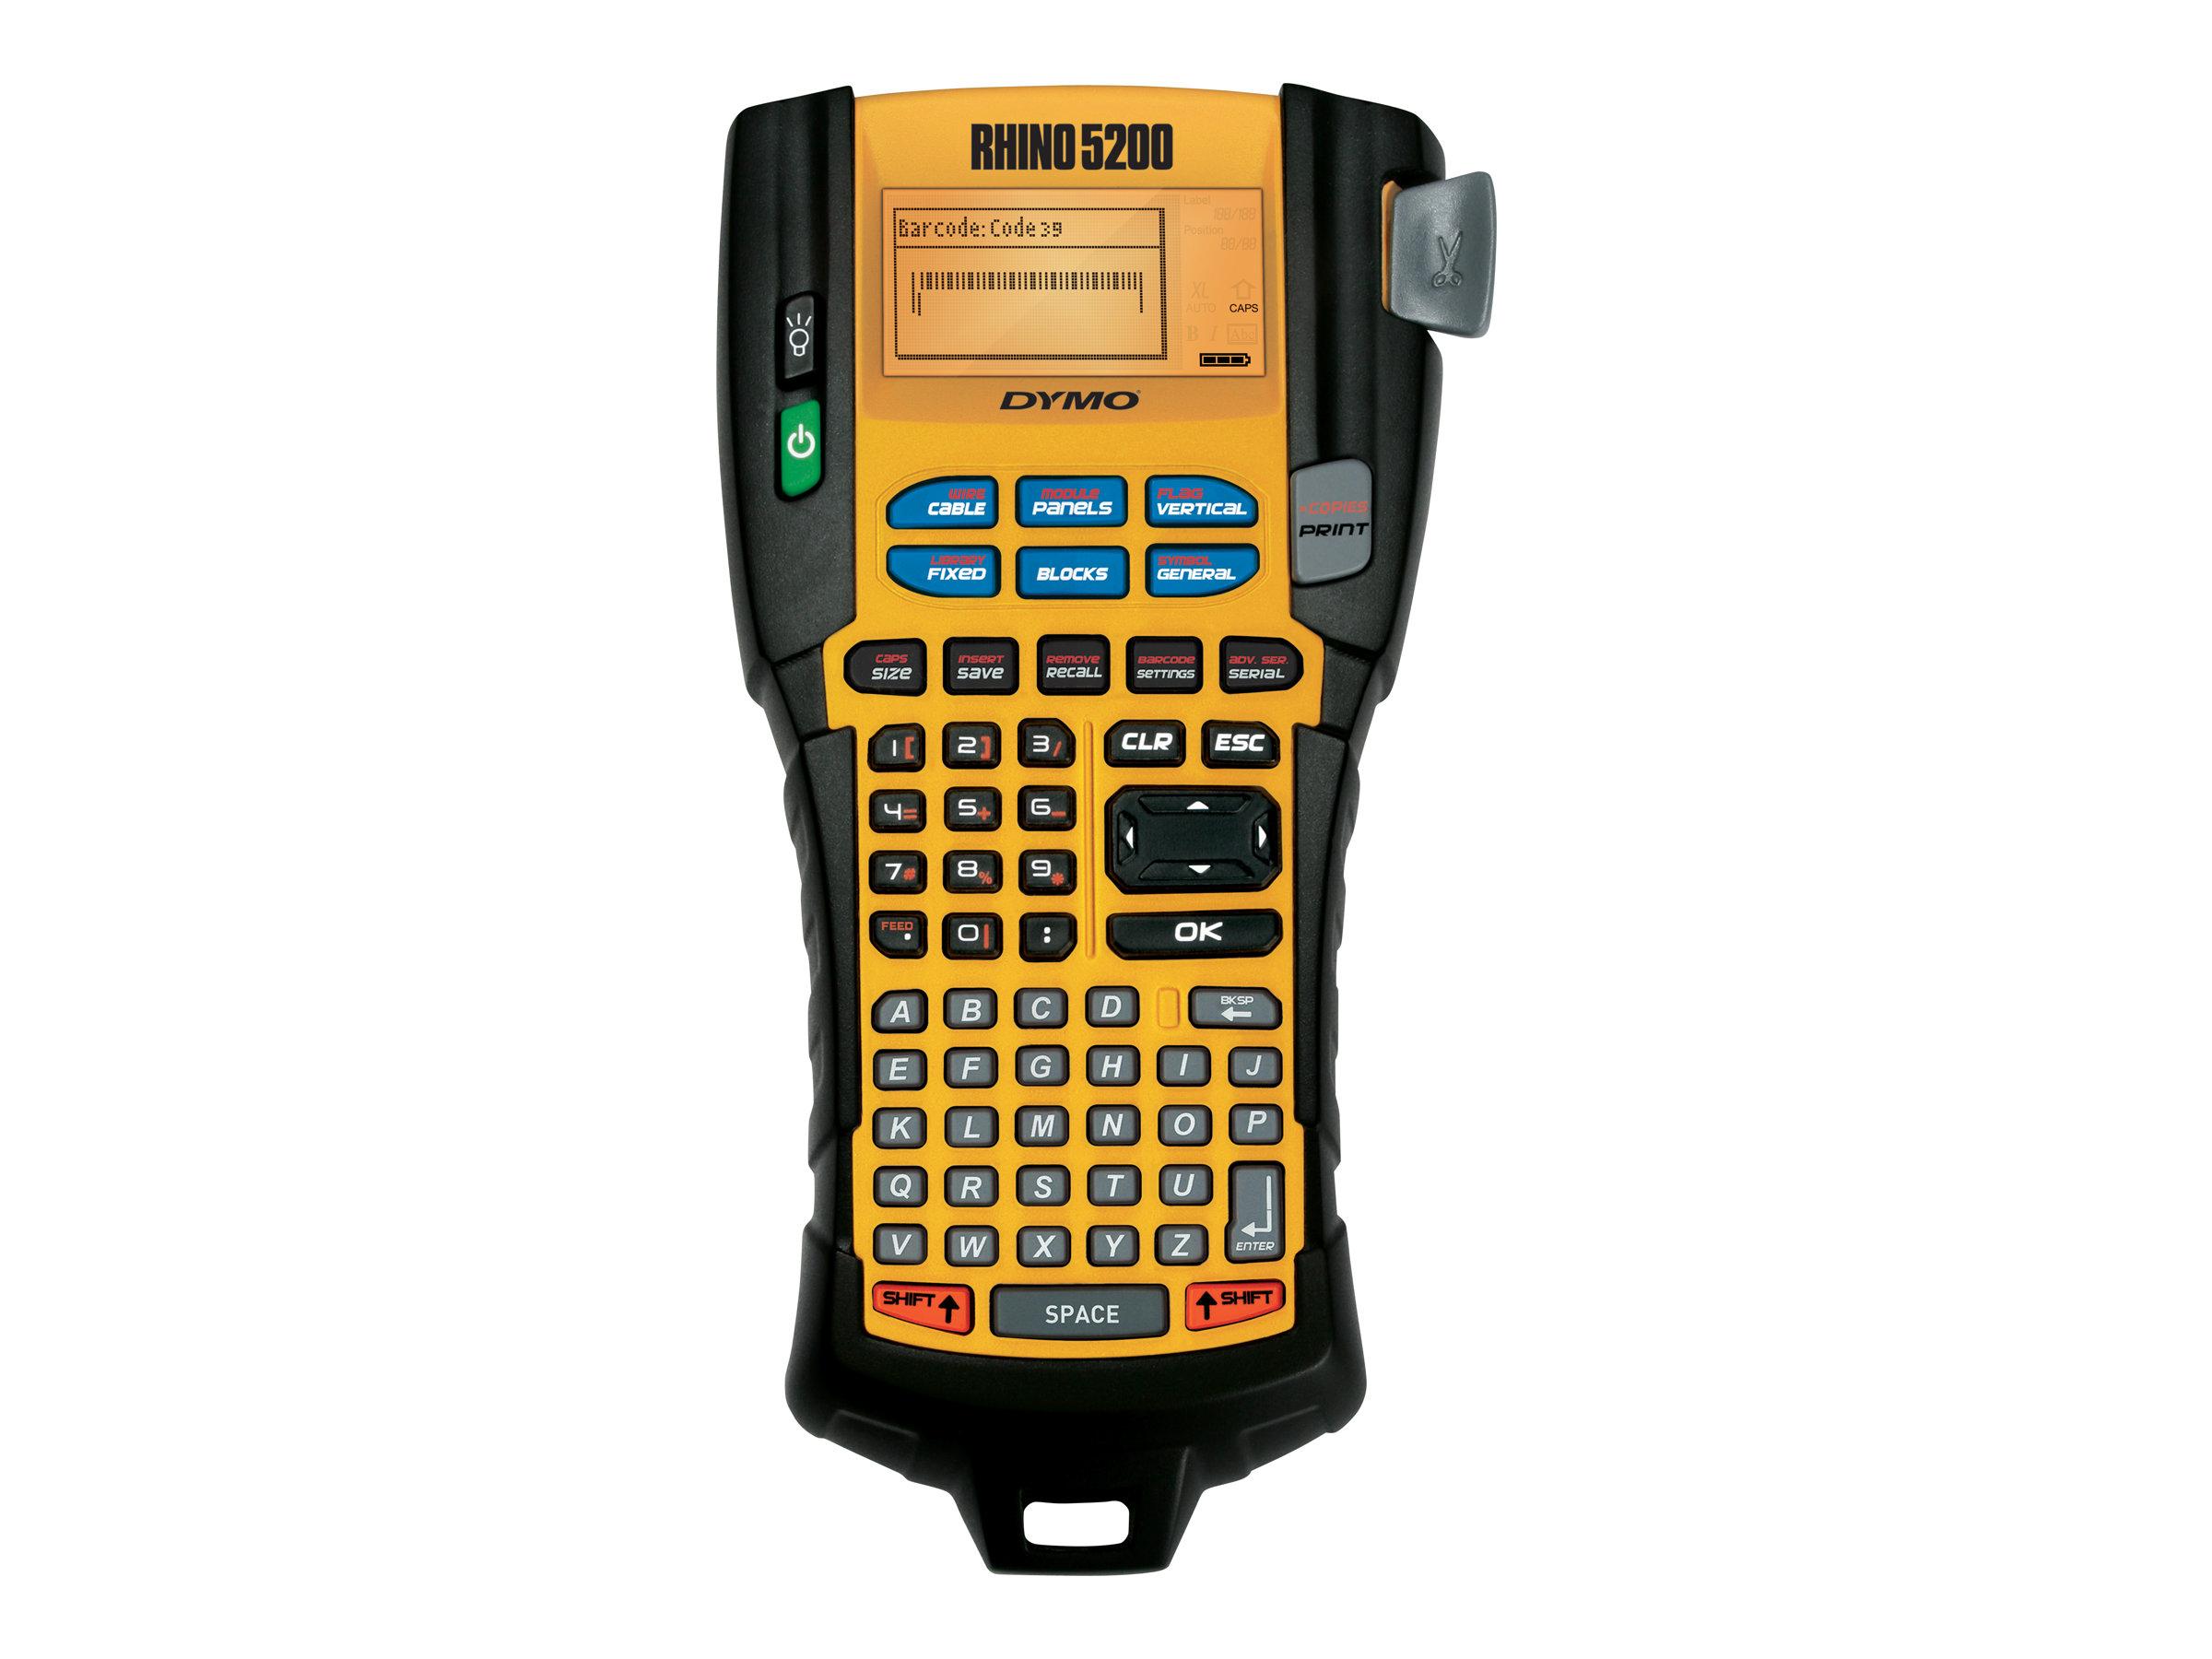 Dymo Rhino 5200 - Hard Case Kit - Beschriftungsgerät - s/w - Rolle (1,9 cm)